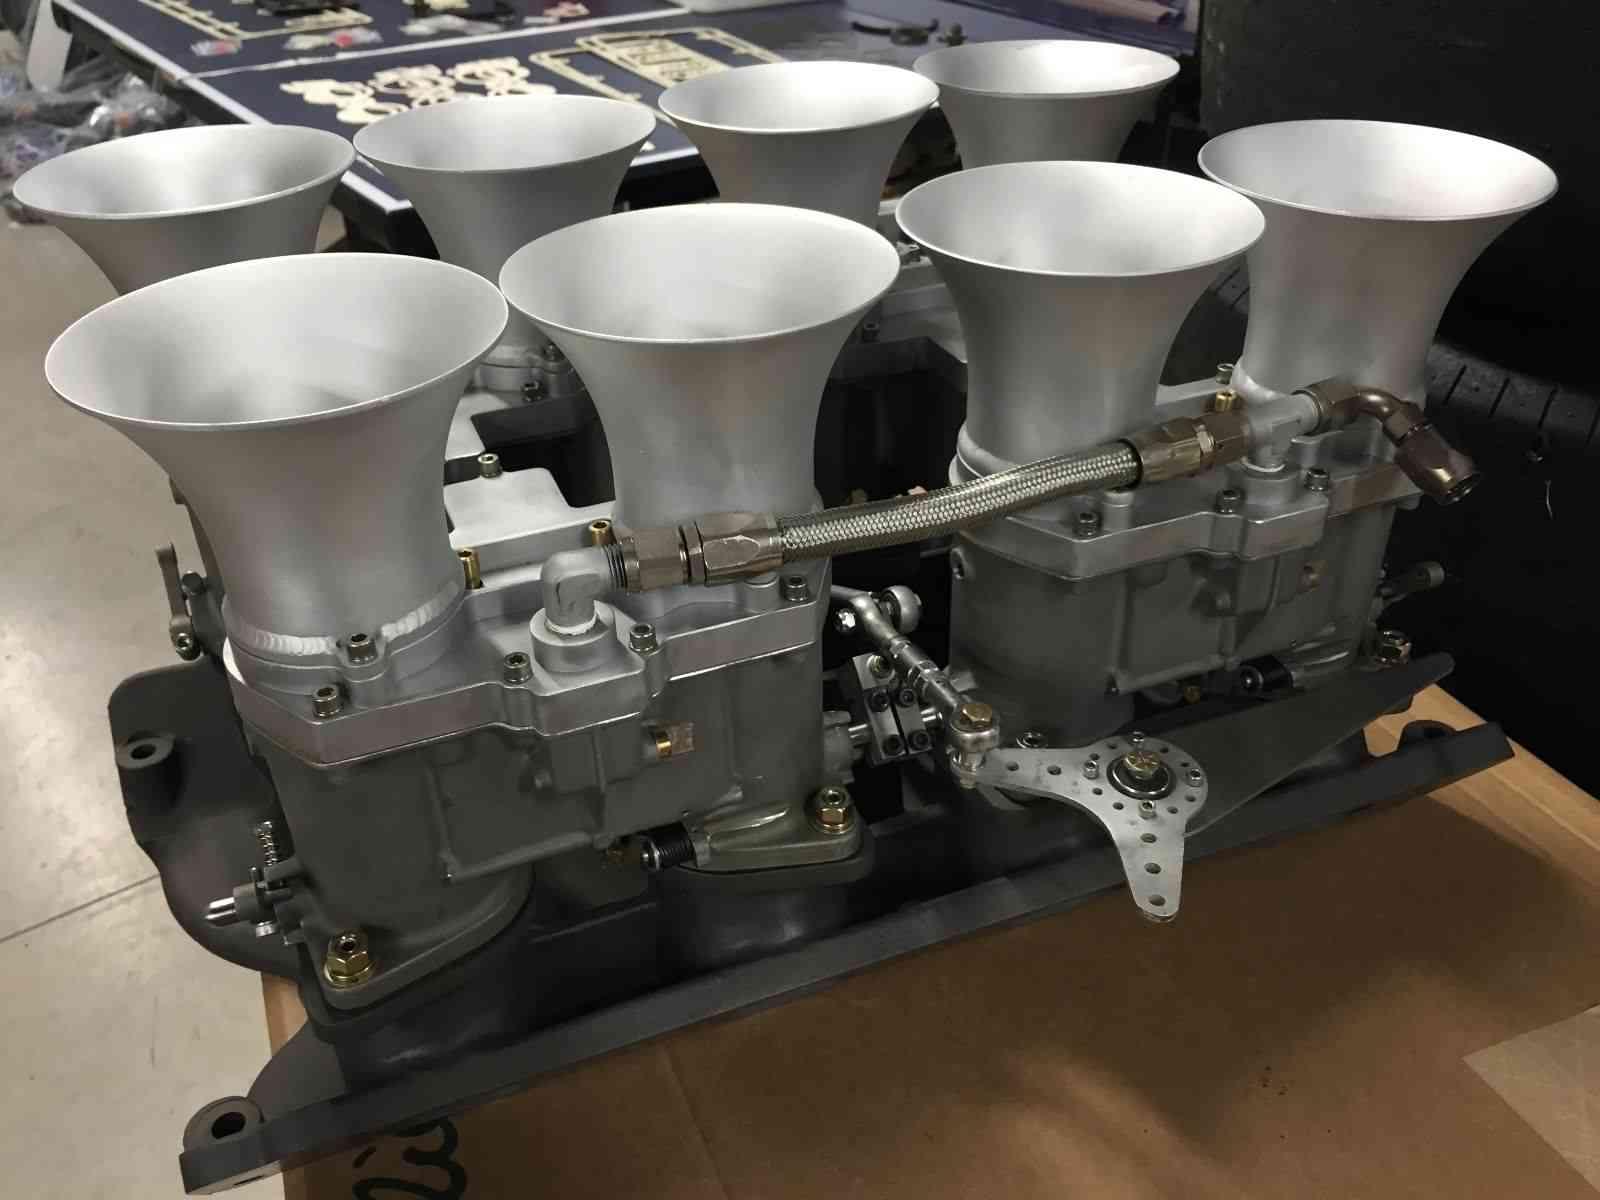 hight resolution of boss 429 engine diagram 7 18 sg dbd de u20221969 ford mustang wiring diagram 302